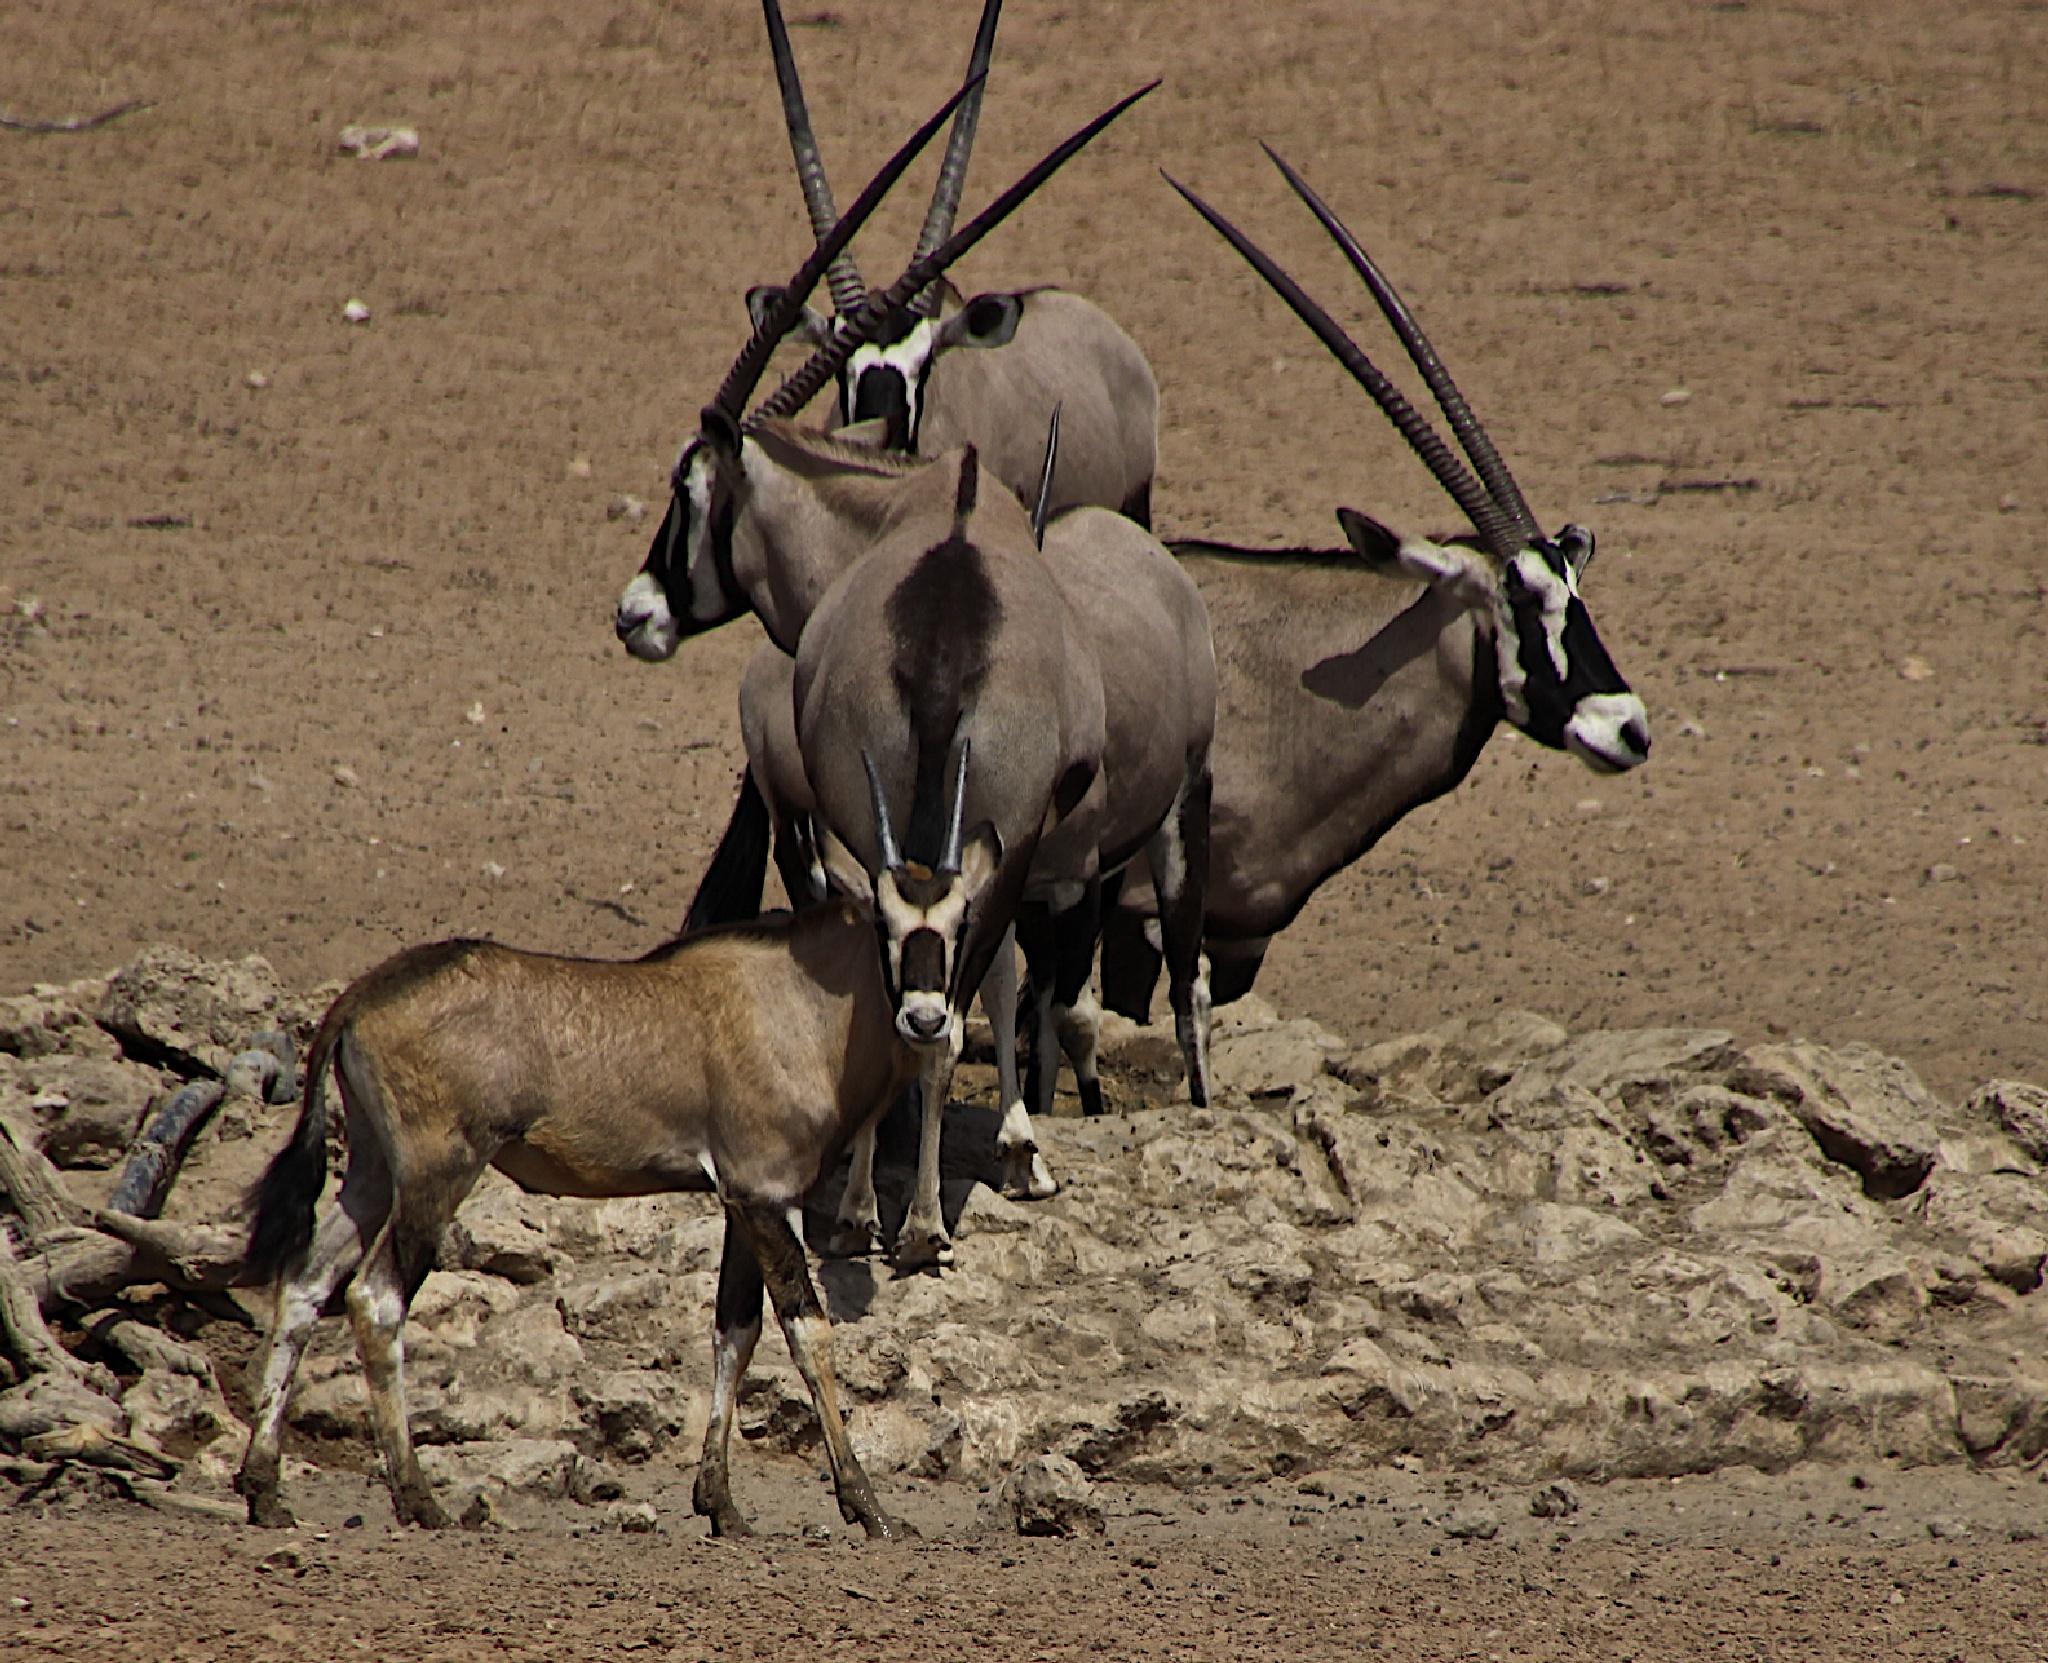 Oryx in the Kalahari by sandybrady